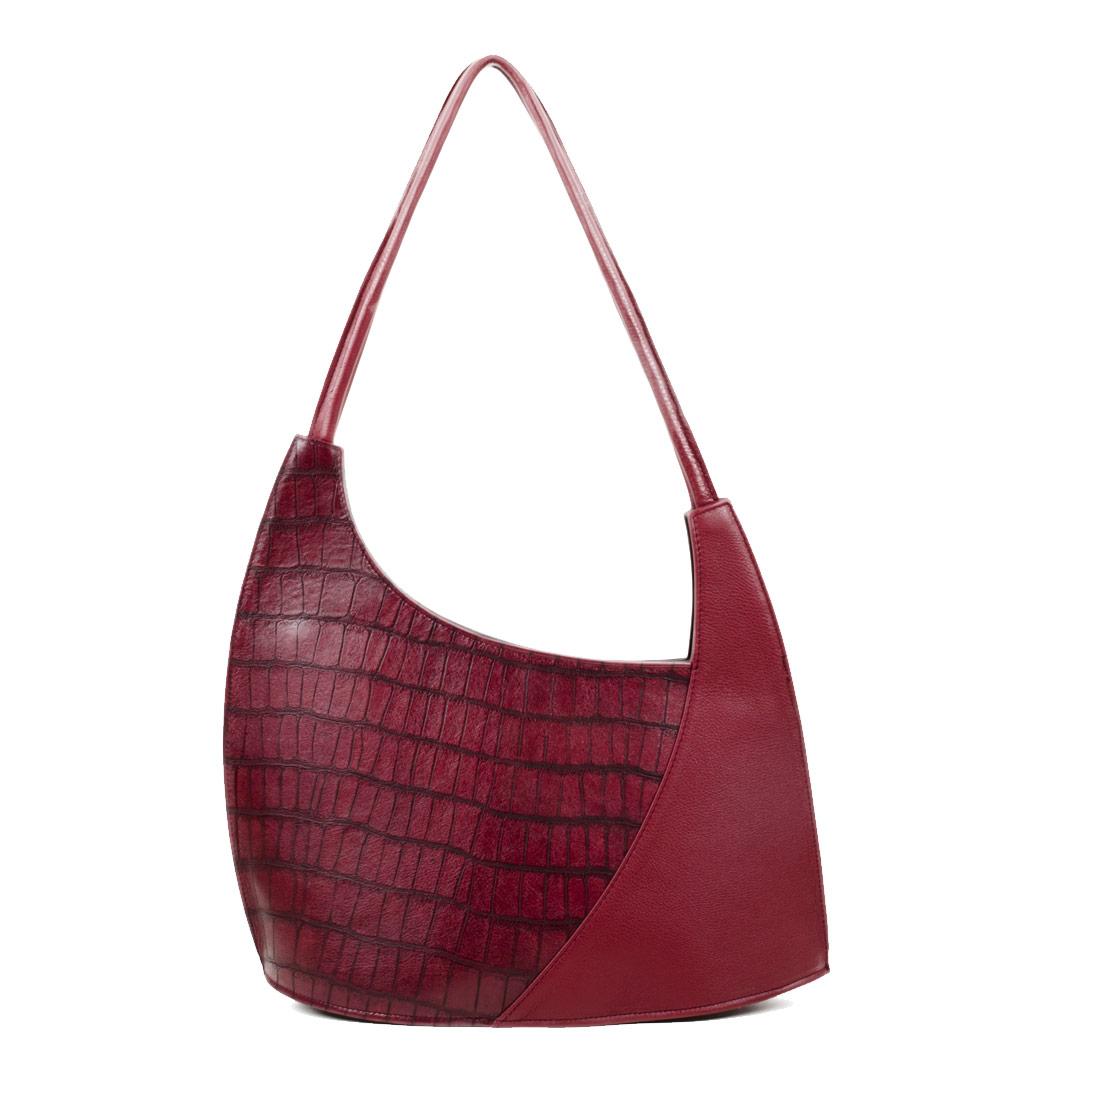 Scoop Burgundy Crocodile Print Leather Shoulder Bag